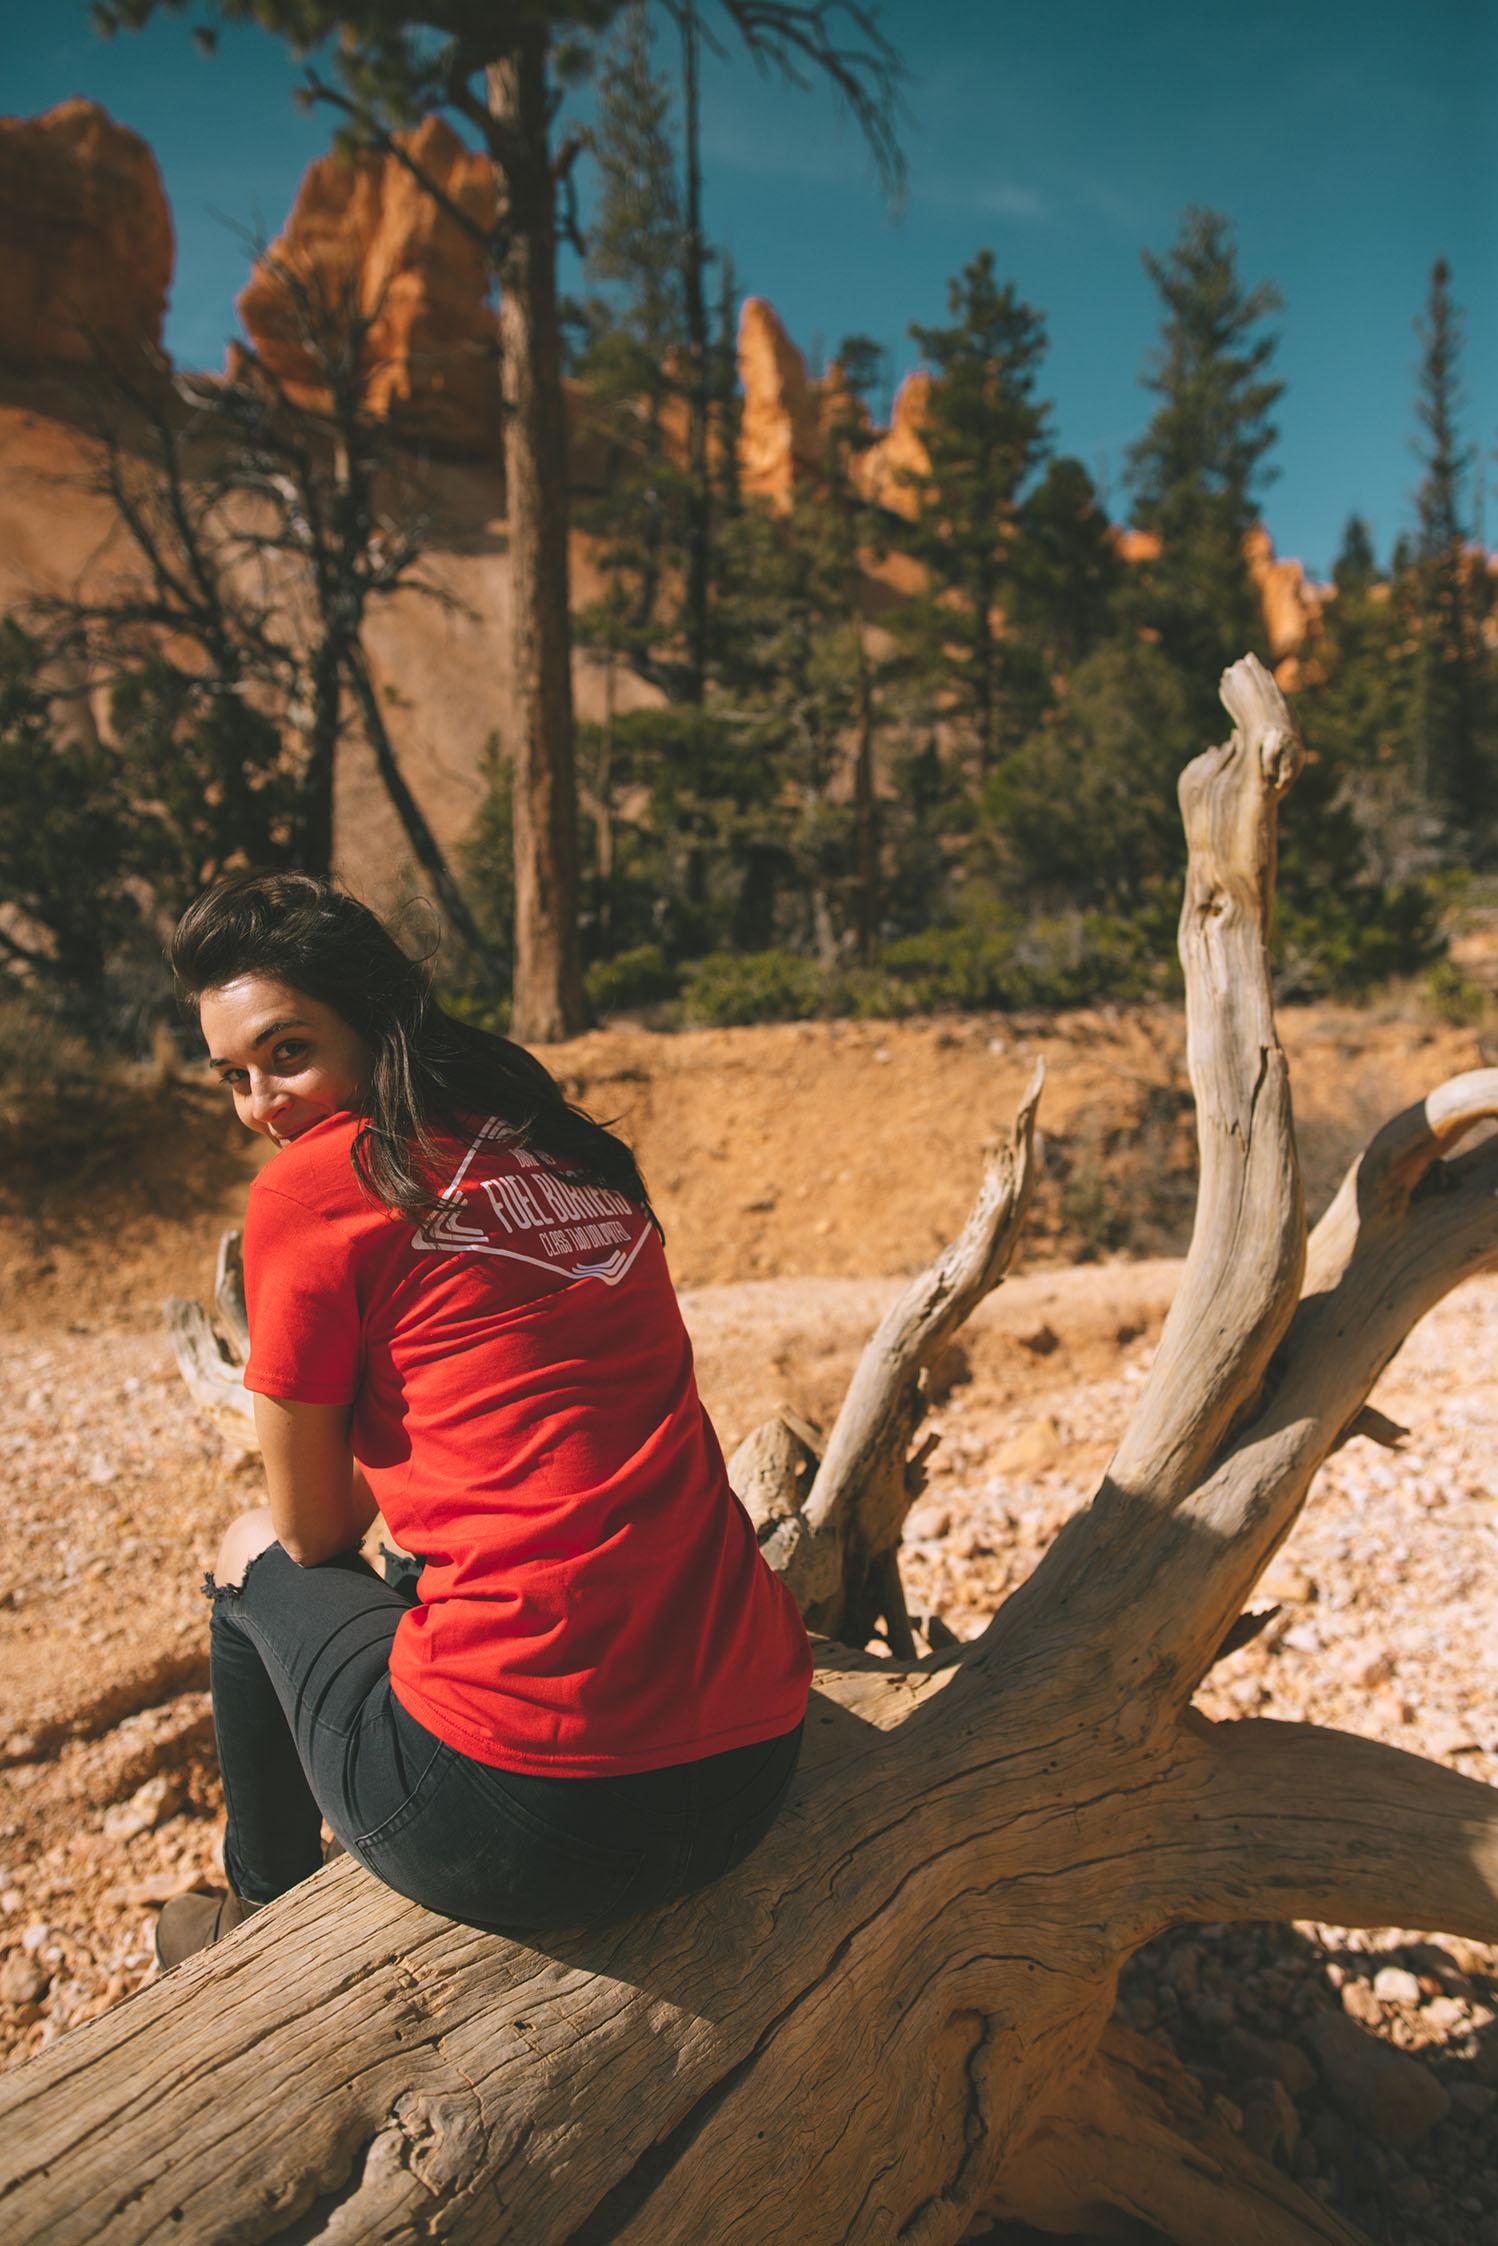 sarah-hirning-bryce-canyon-national-park-utah-dead-rock-studios.jpg